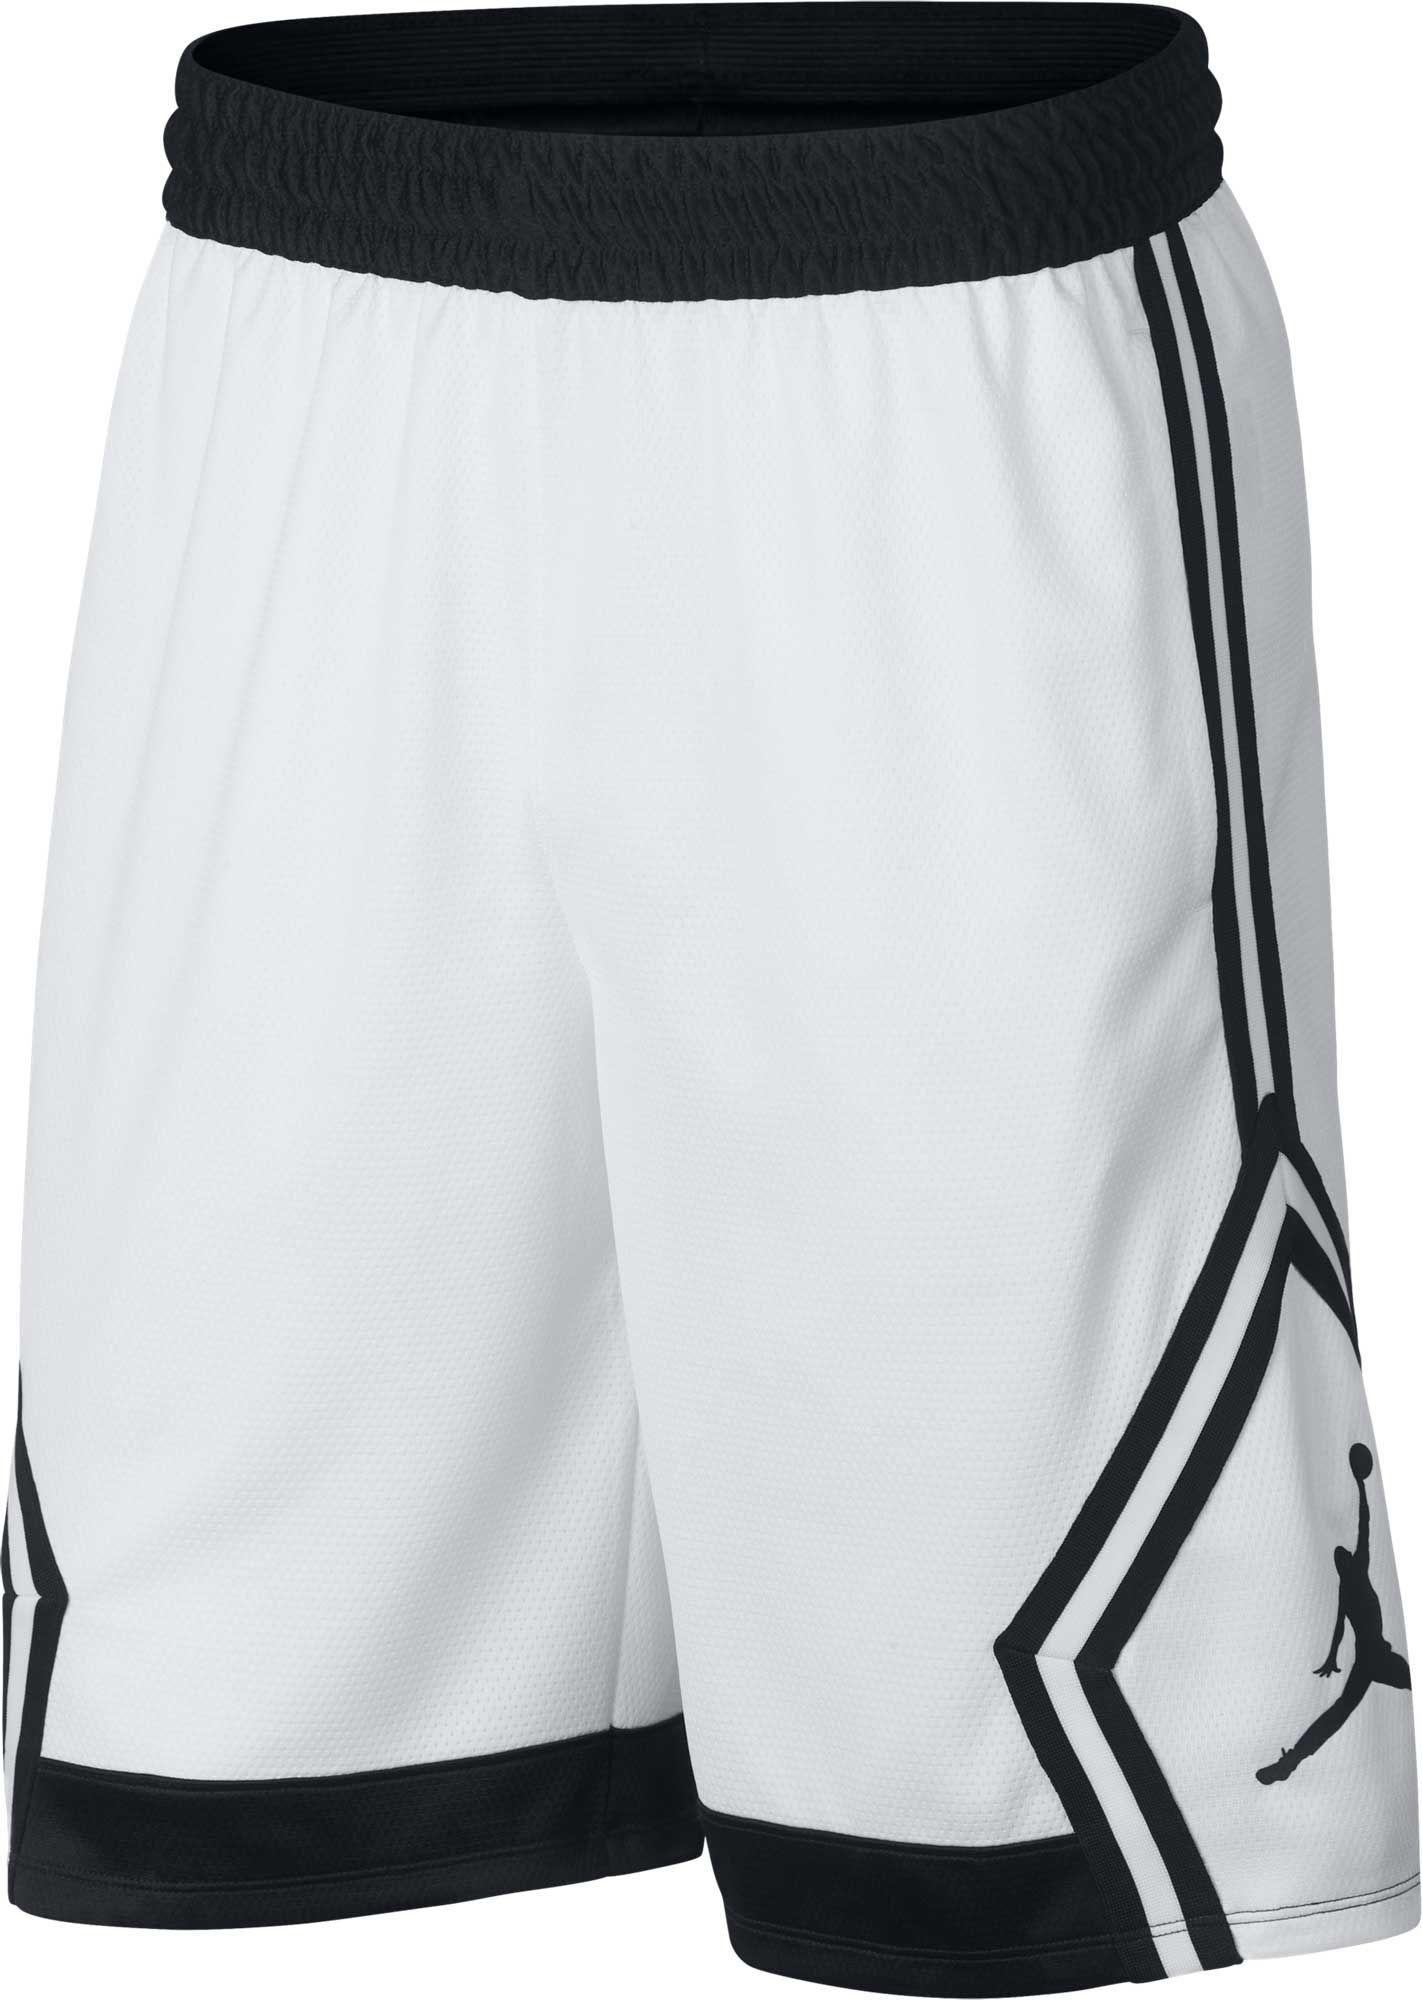 b40430df14a Jordan Men's Rise Diamond Basketball Shorts | Products | Track pants ...